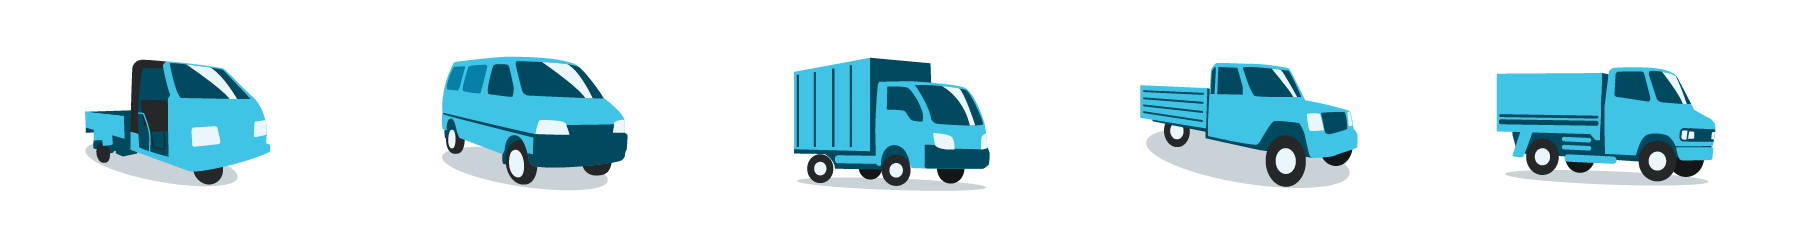 Illustrations for various types of trucks